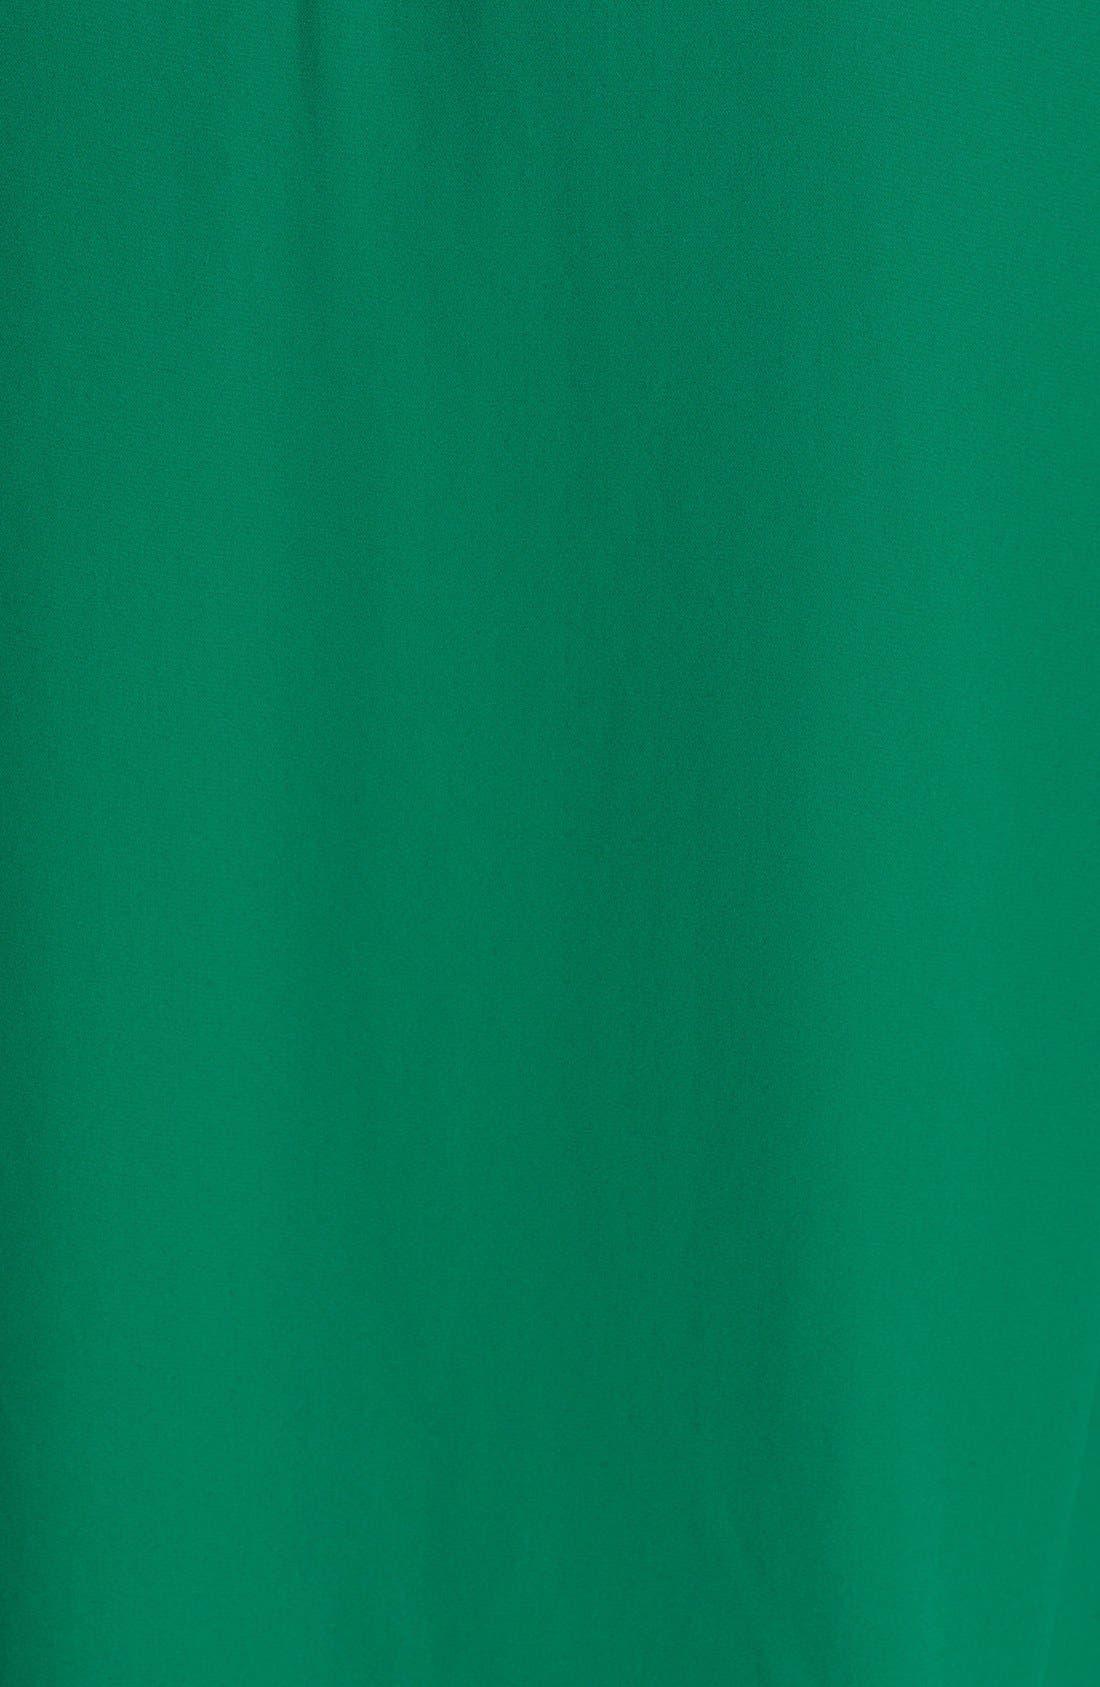 Alternate Image 3  - Ro & De Studded Chiffon Blouson Top